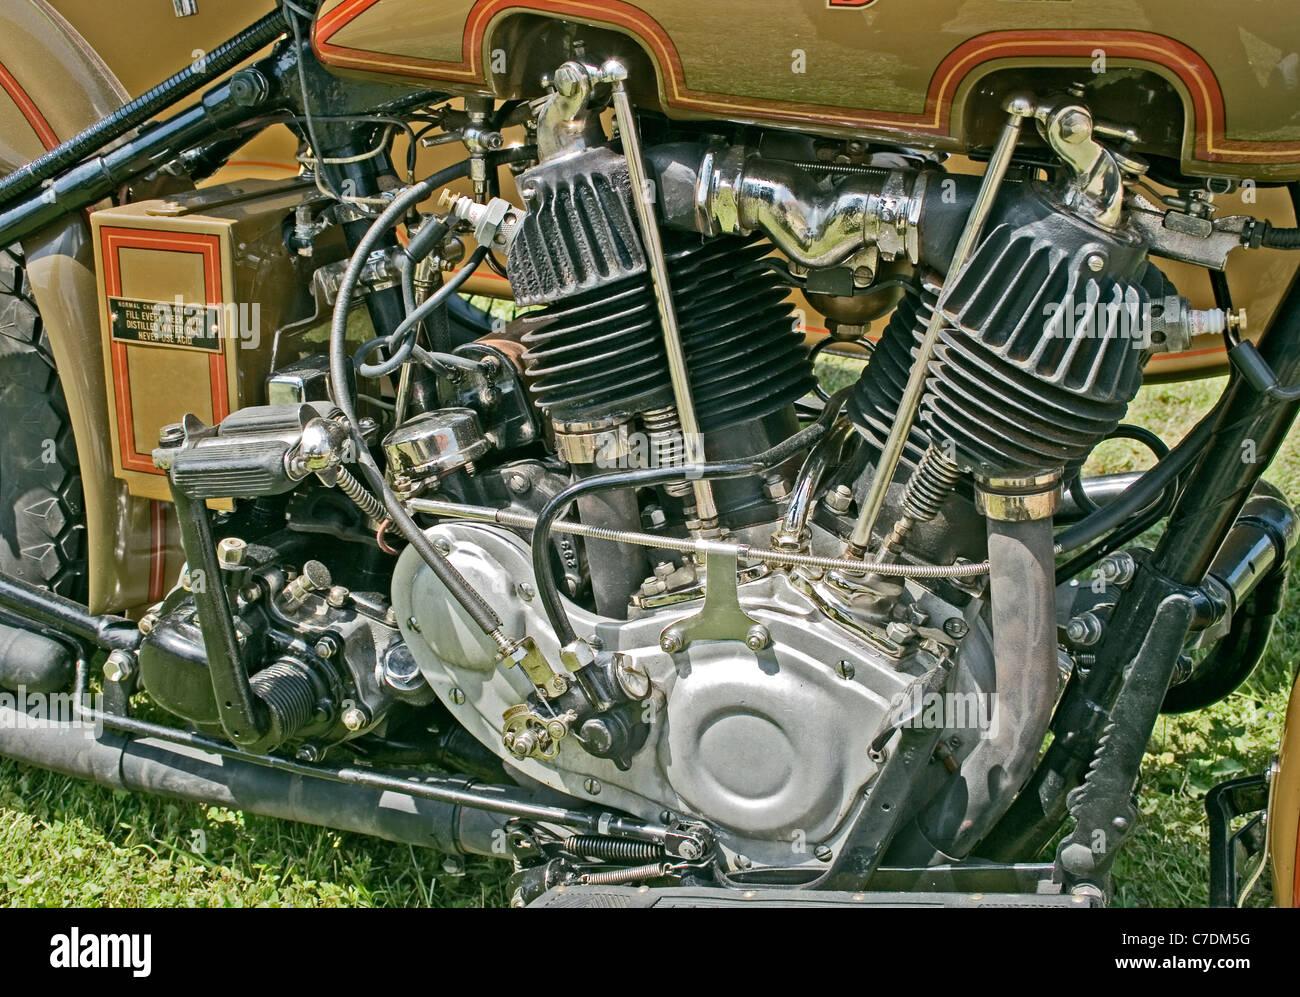 Jet Engine Diagram Pulse Jet Engine Diagram